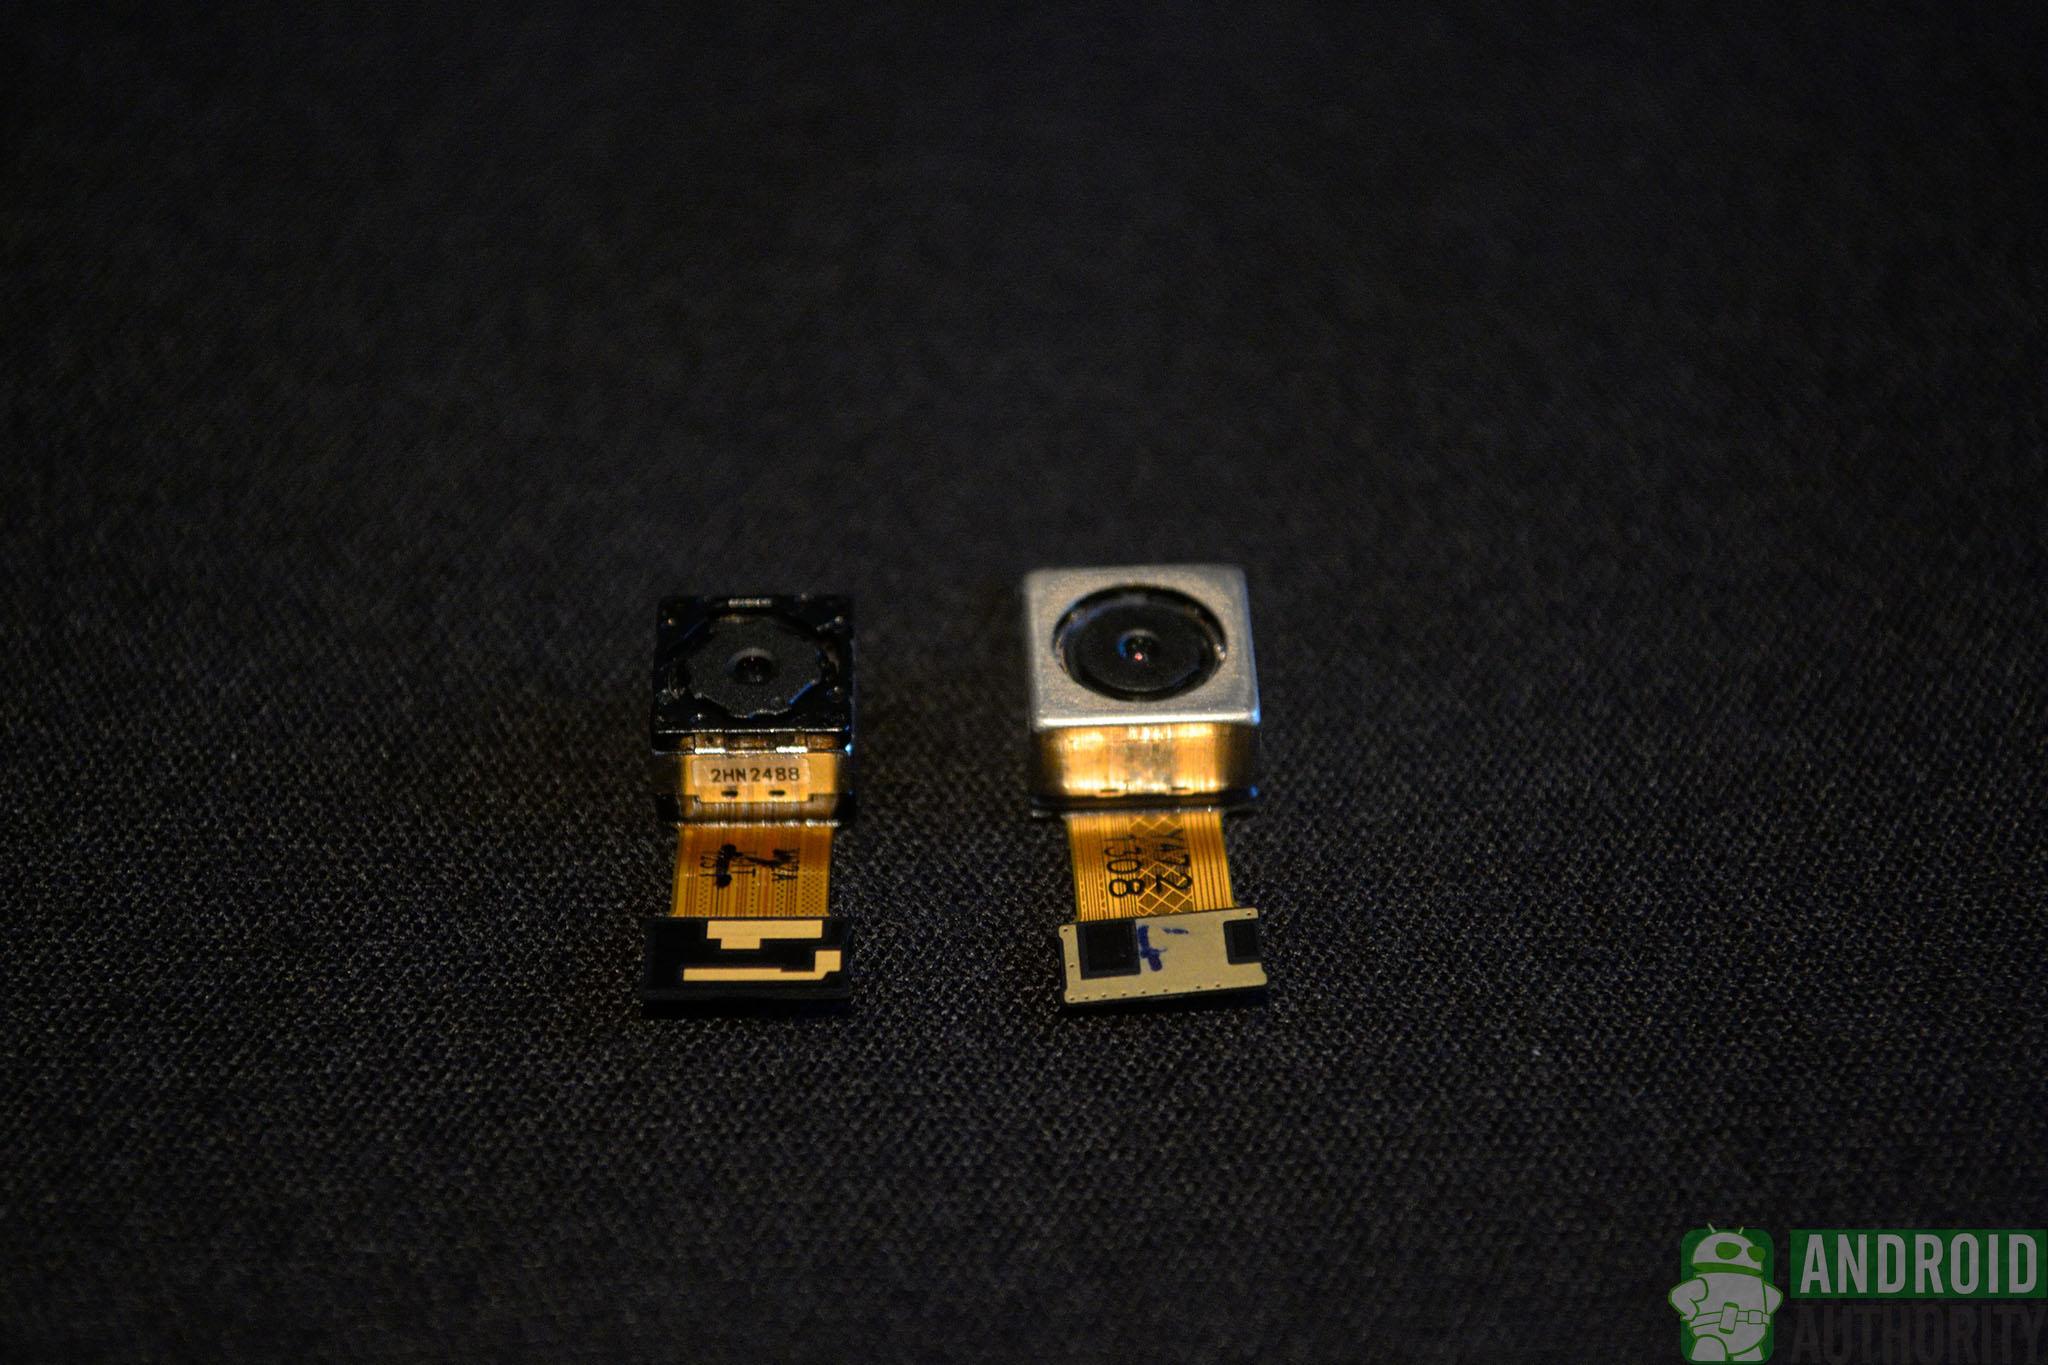 aa-lg-g2-camera-sensor(left)-with-g-sensor(right)